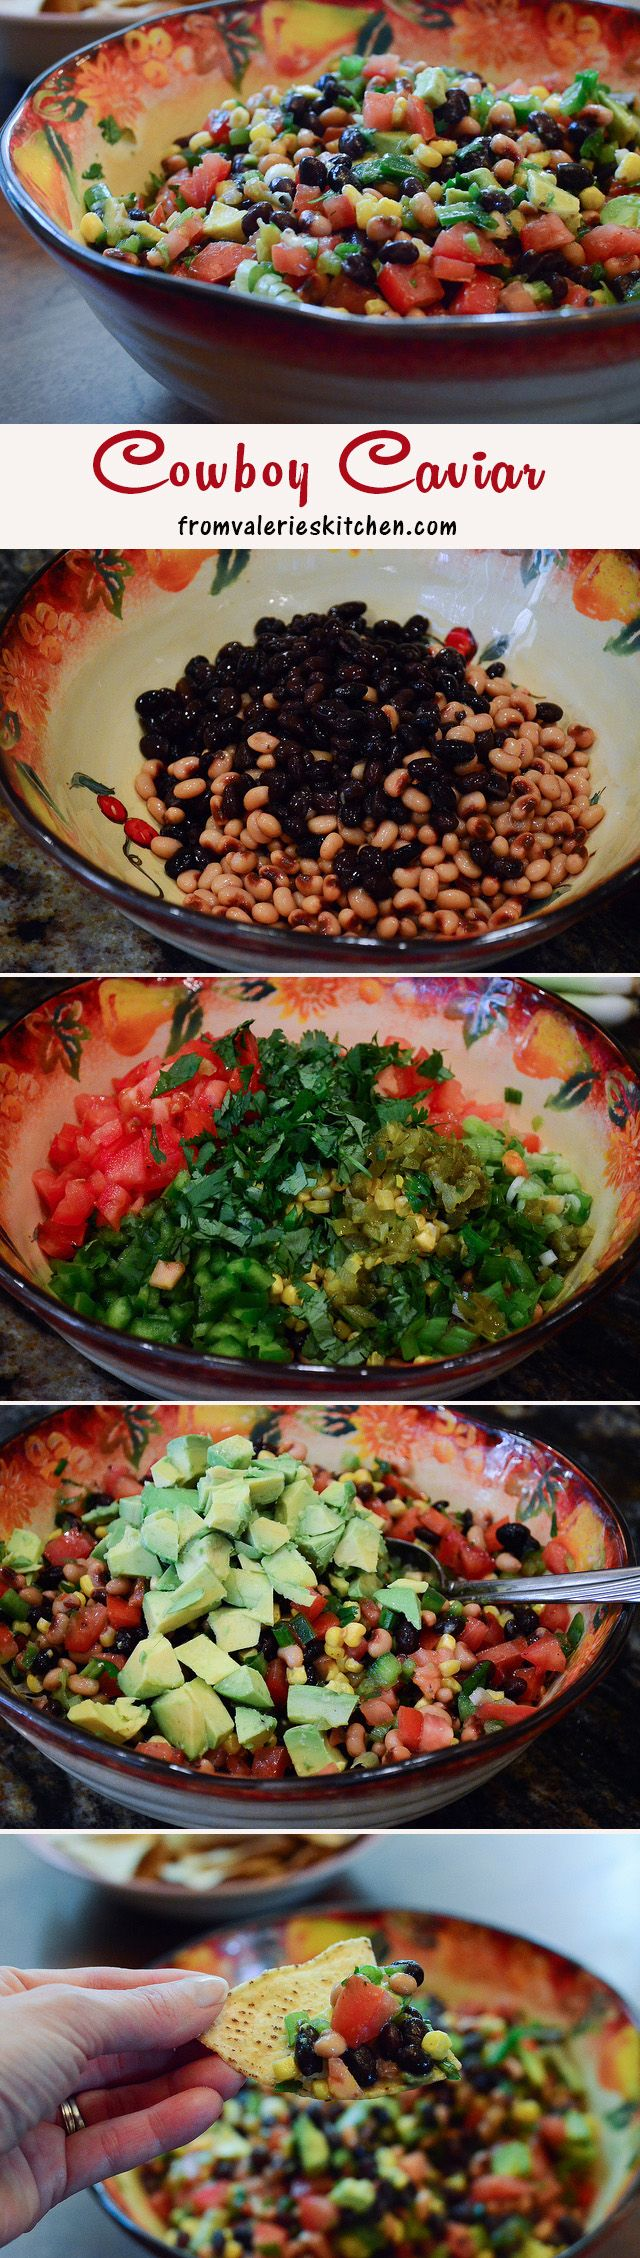 Cowboy Caviar – a fresh, healthy, DELICIOUS appetizer